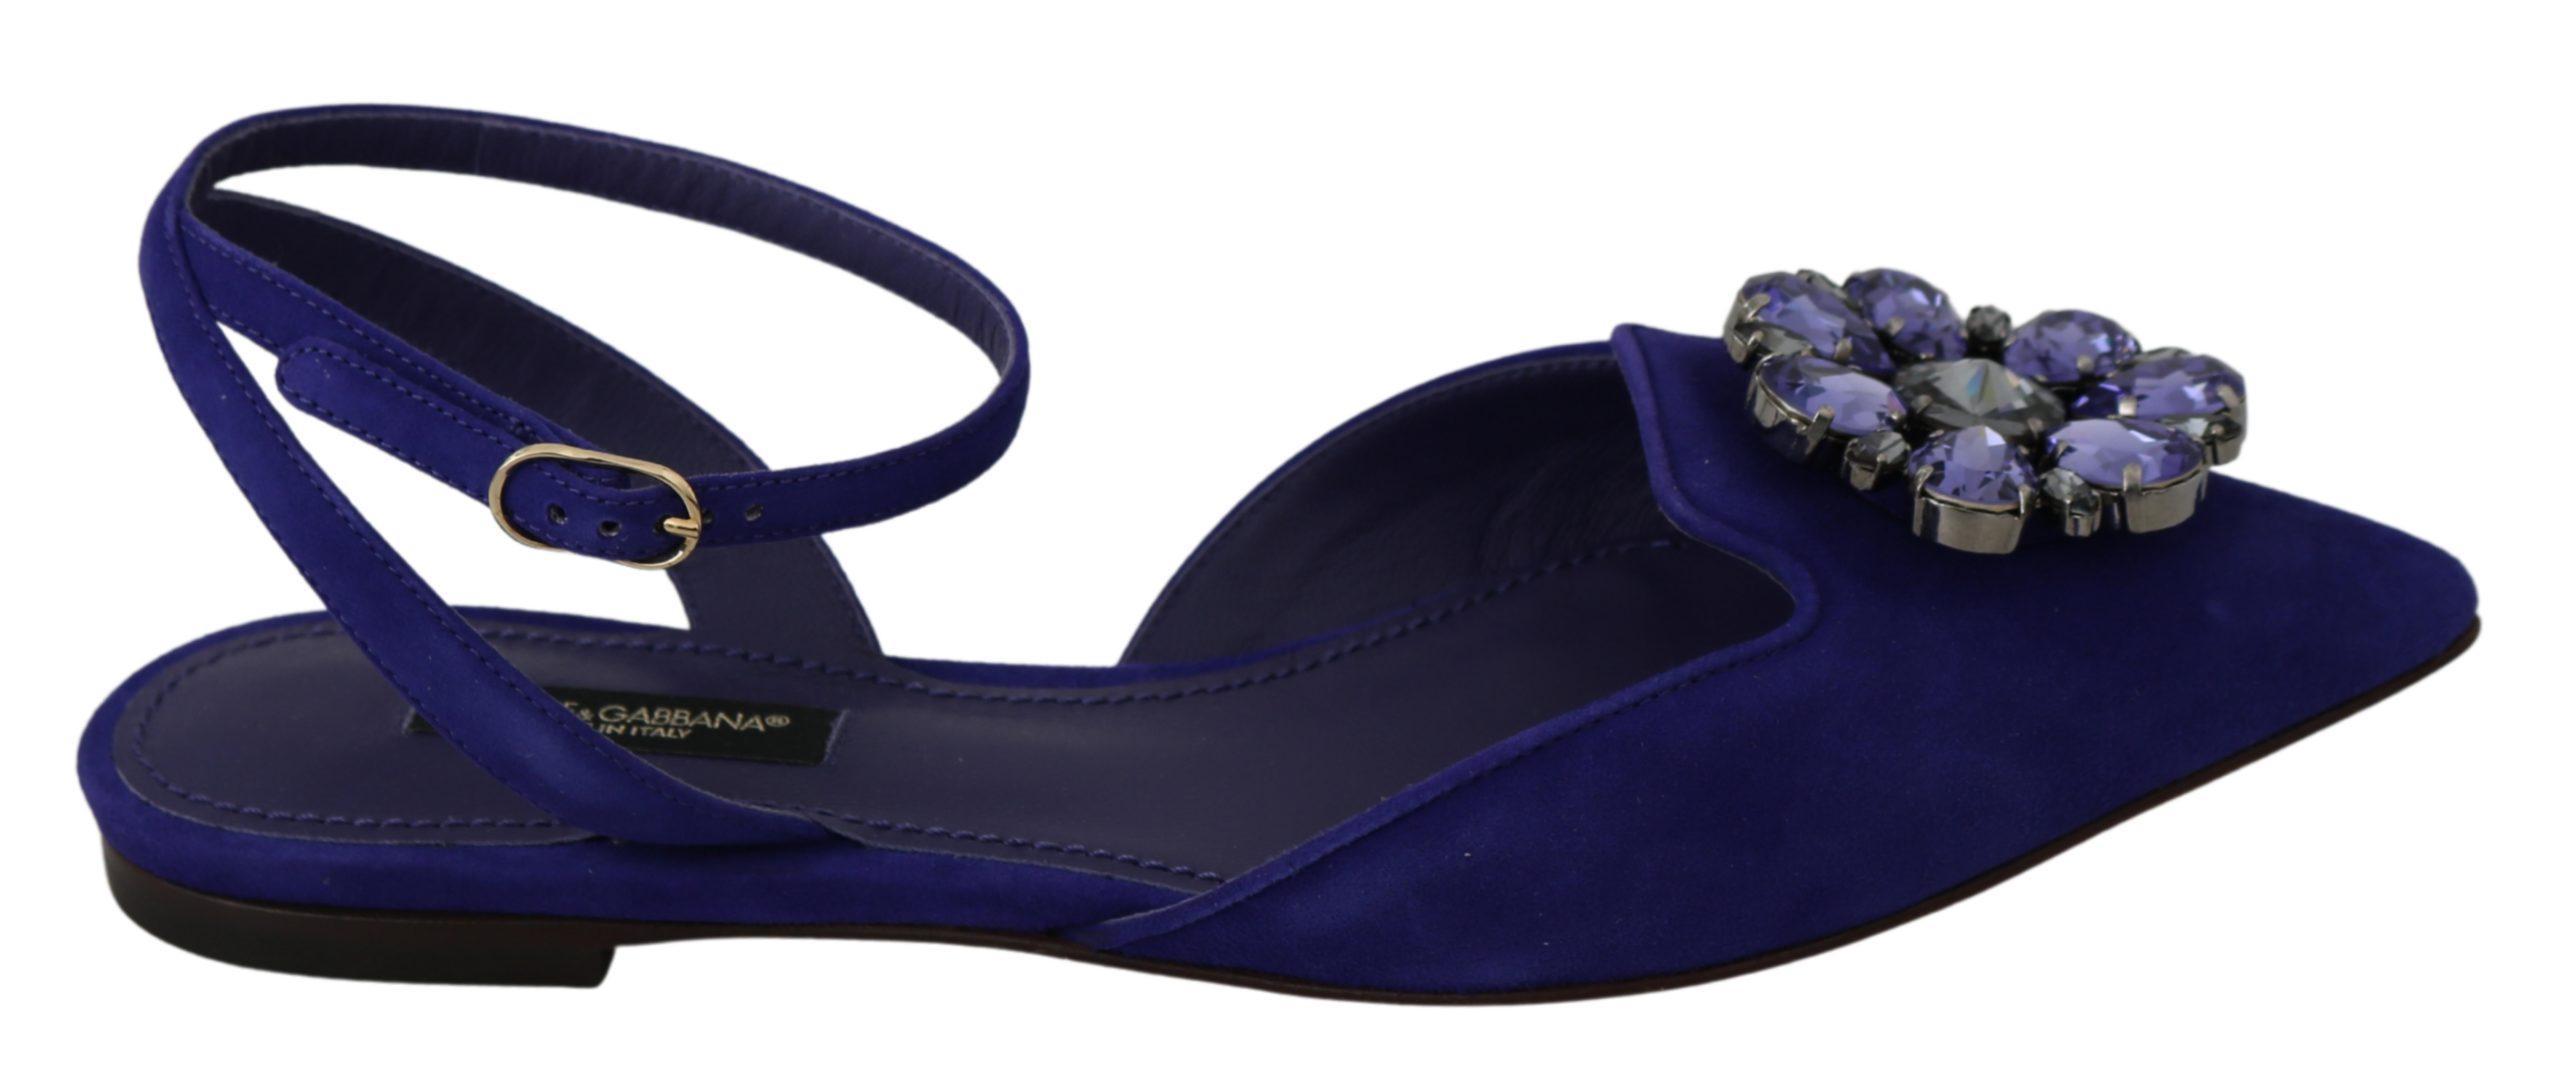 Dolce & Gabbana Women's Suede Crystal Flats Pointed Shoes Blue LA6565 - EU35/US4.5